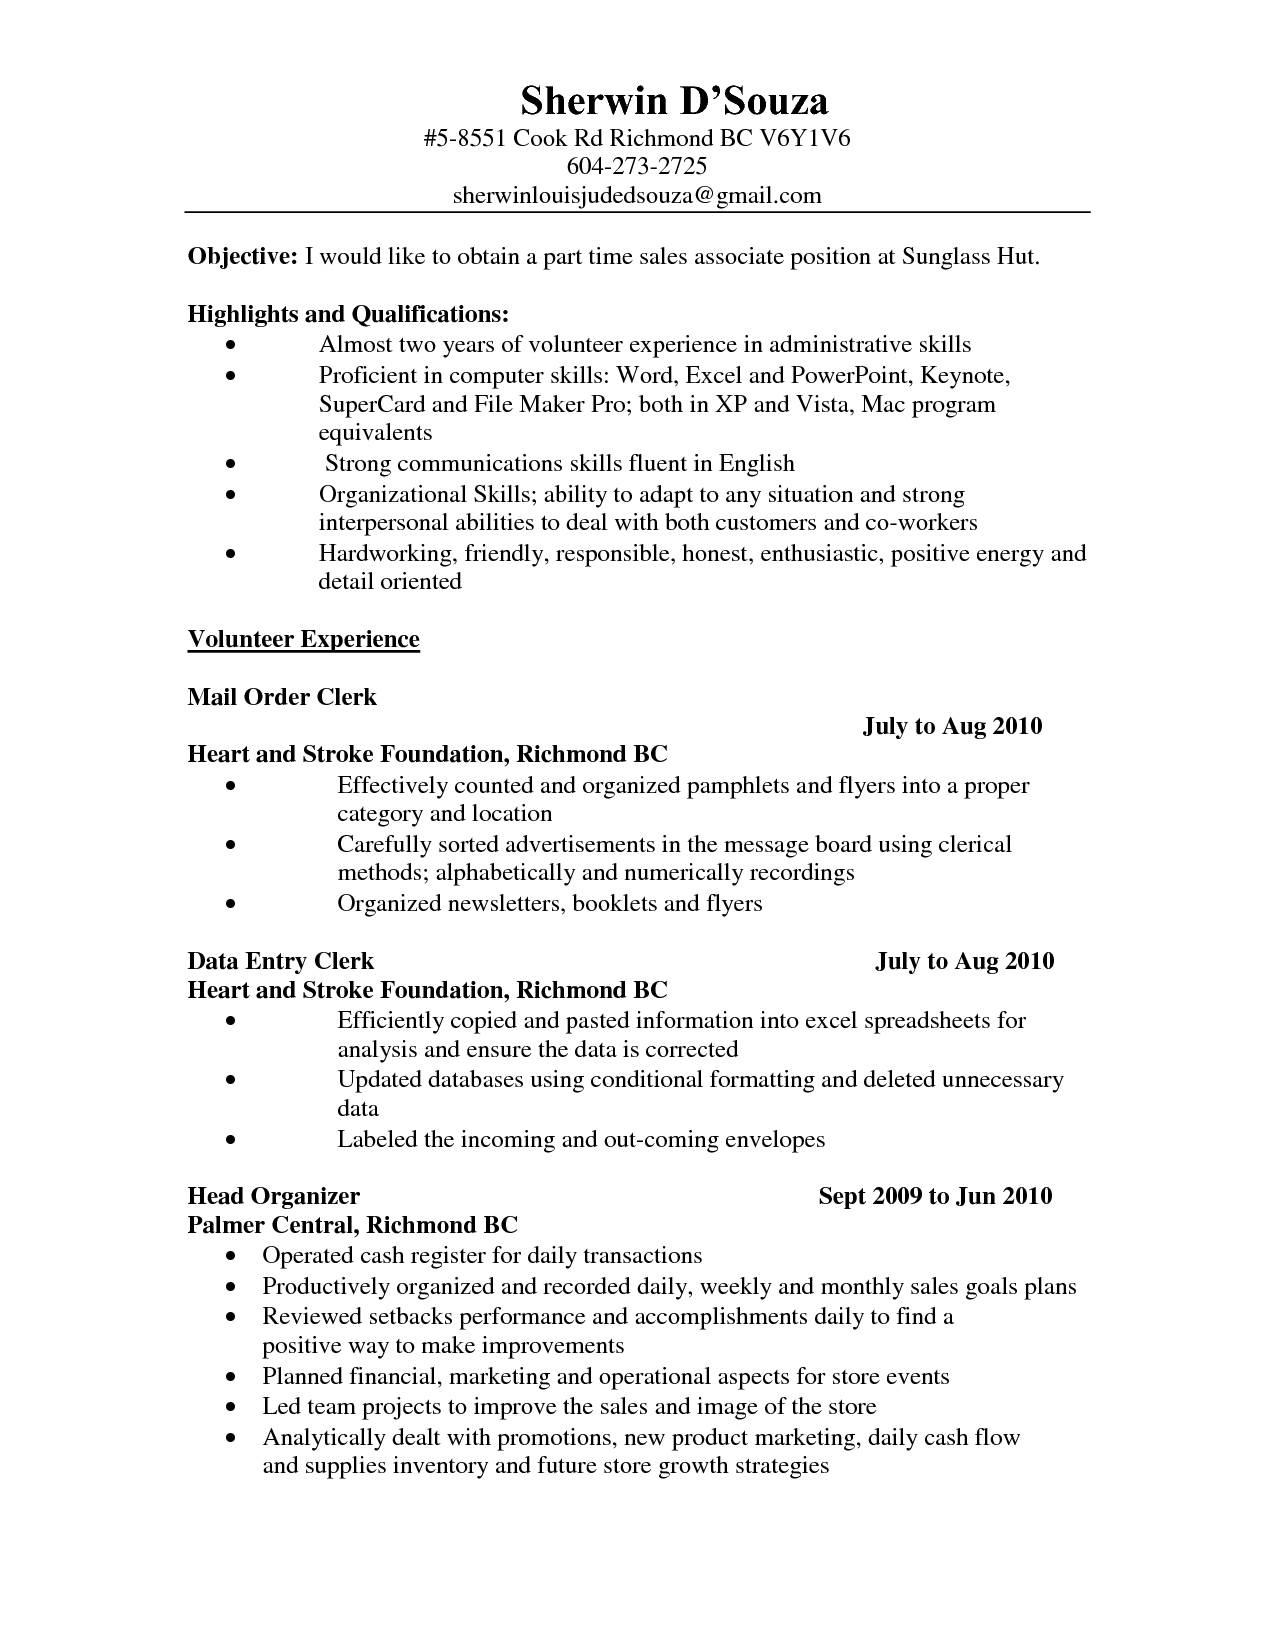 10 Trendy Ideas For Part Time Jobs mcdonalds cook job description resume best of brilliant ideas sample 2020